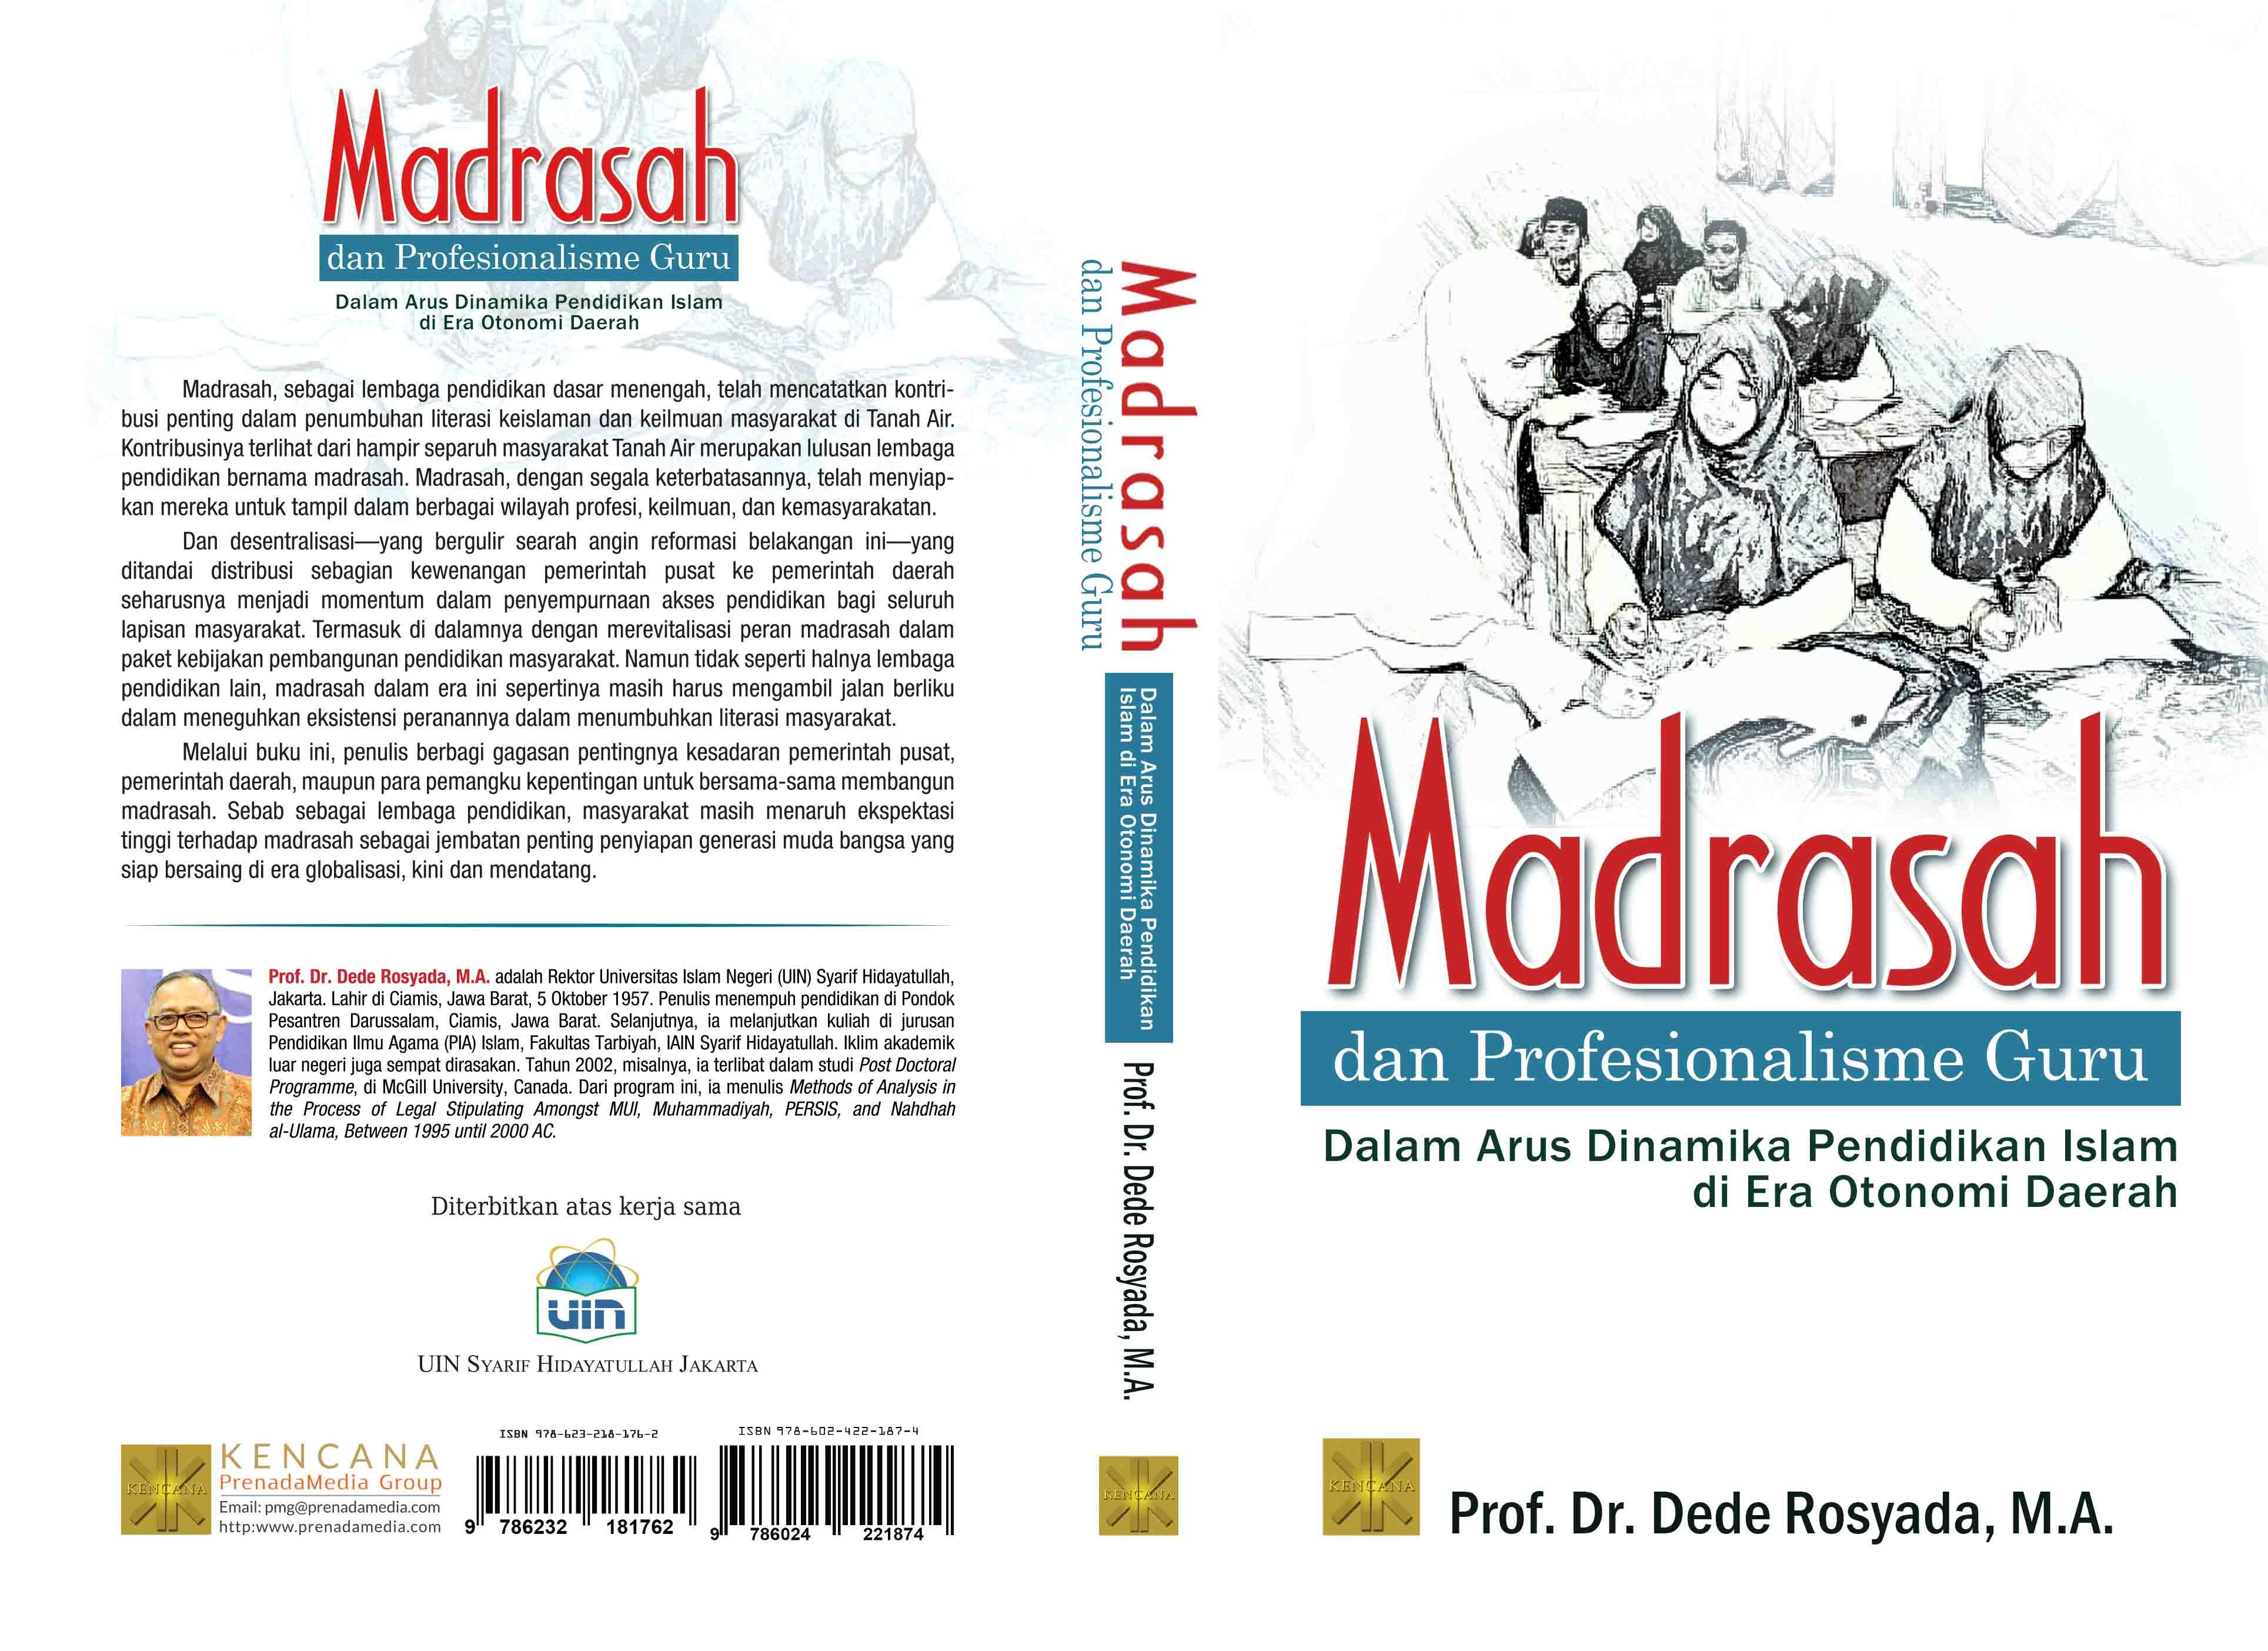 Madrasah dan profesionalisme guru [sumber elektronis] : dalam arus dinamika pendidikan Islam di era otonomi daerah